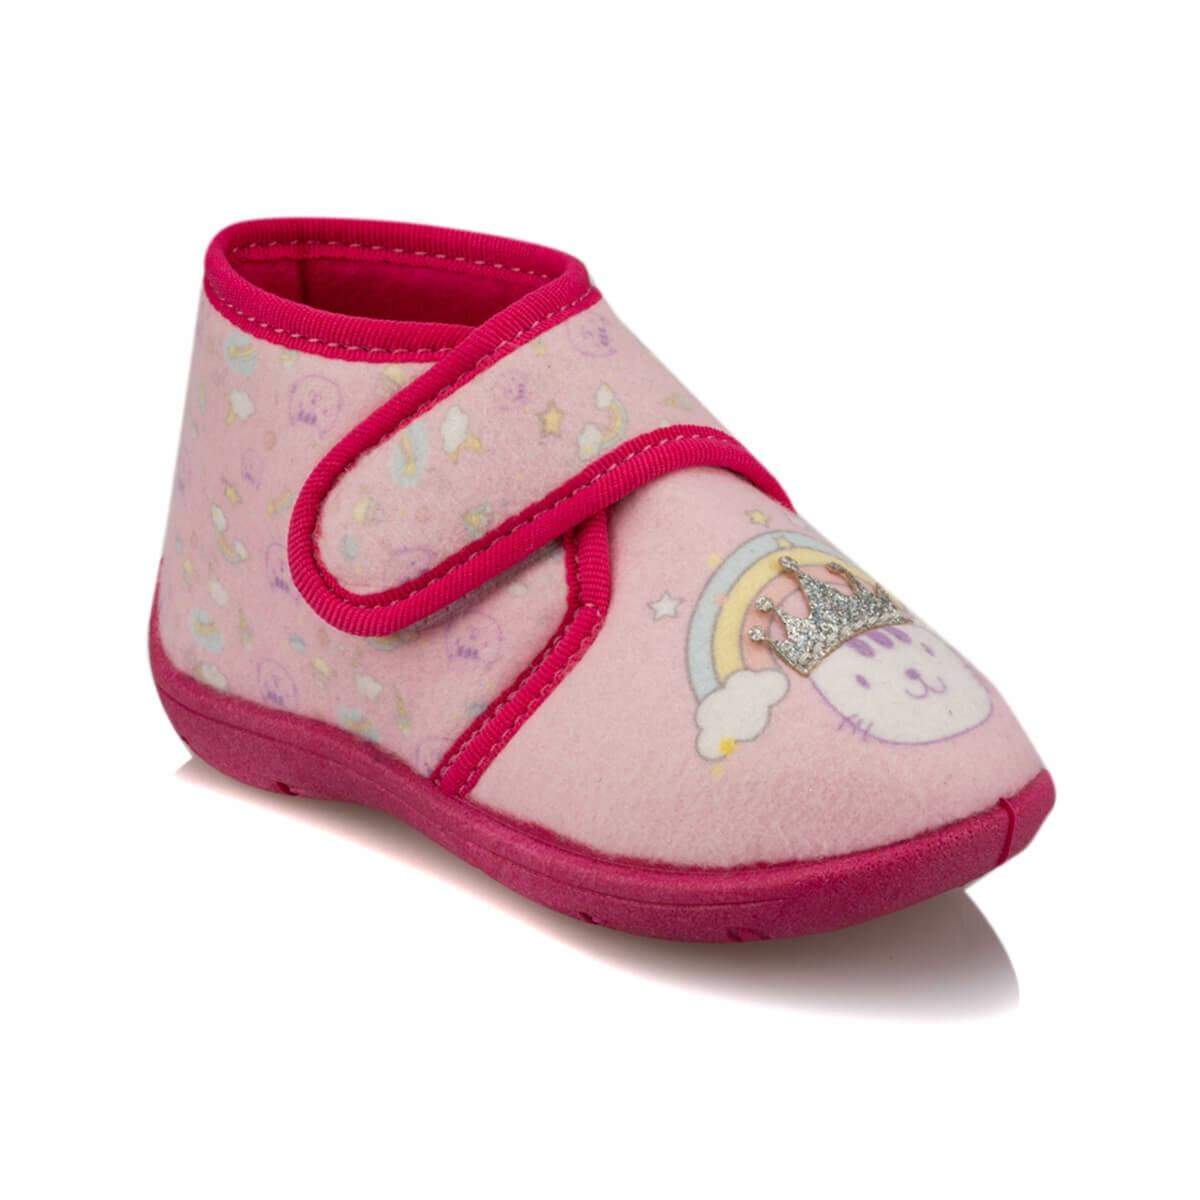 FLO 92.512059.P Pink Female Child Panduf Polaris